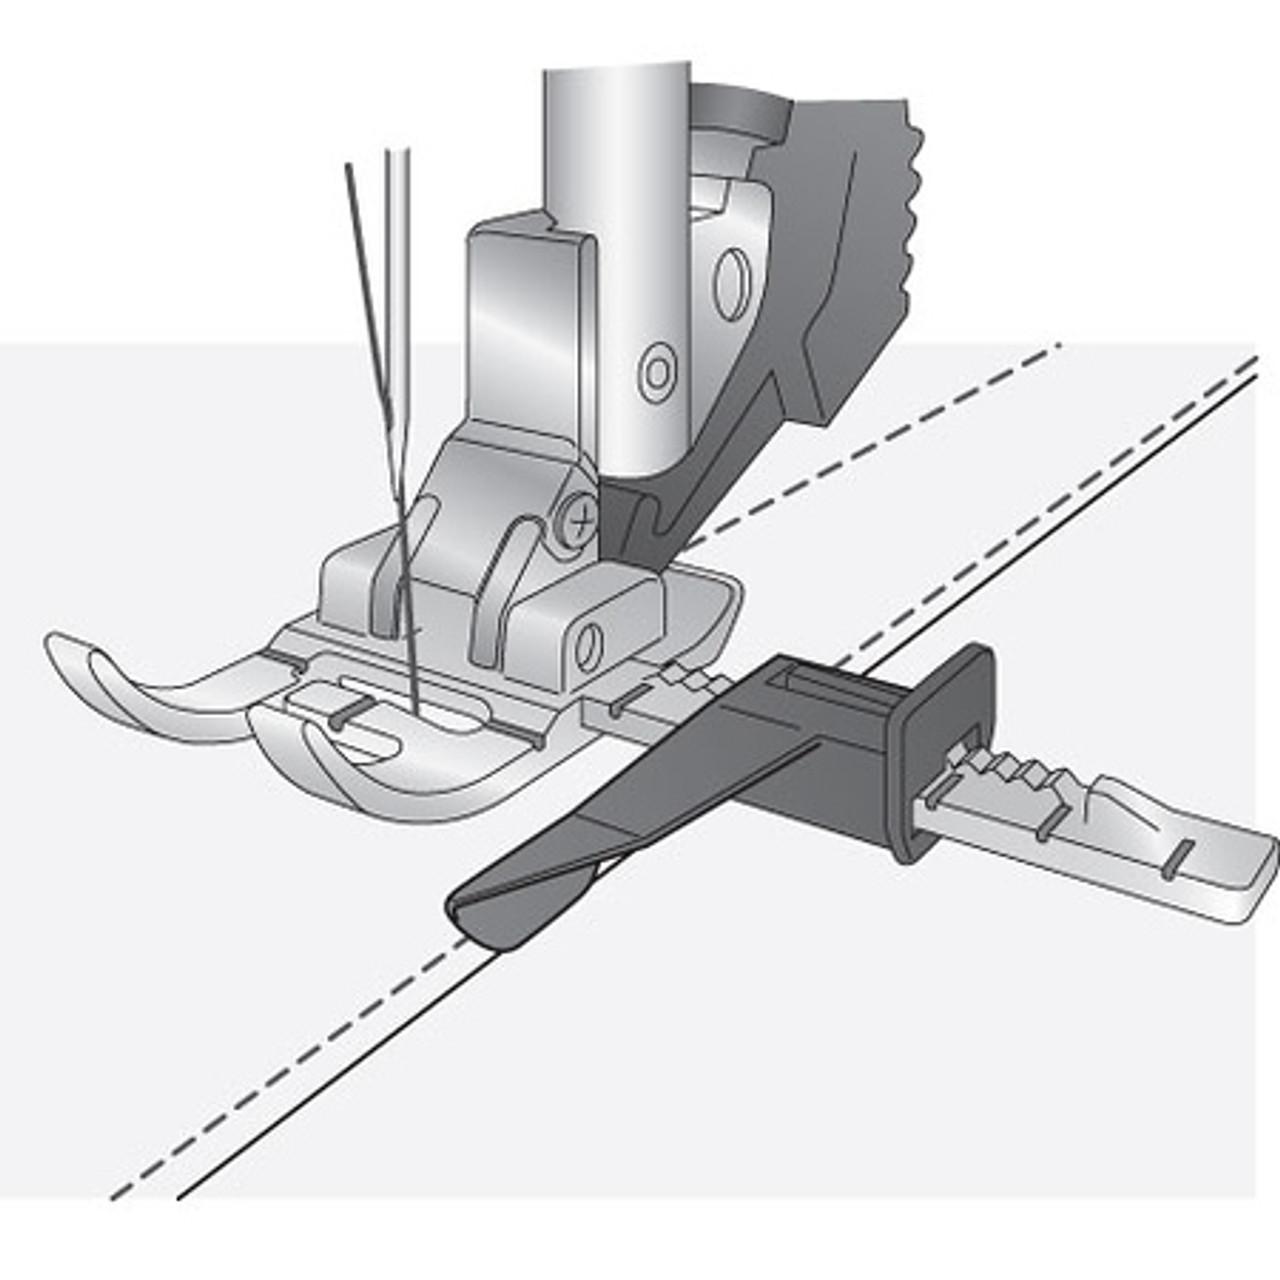 Adjustable Guide Foot For IDT System